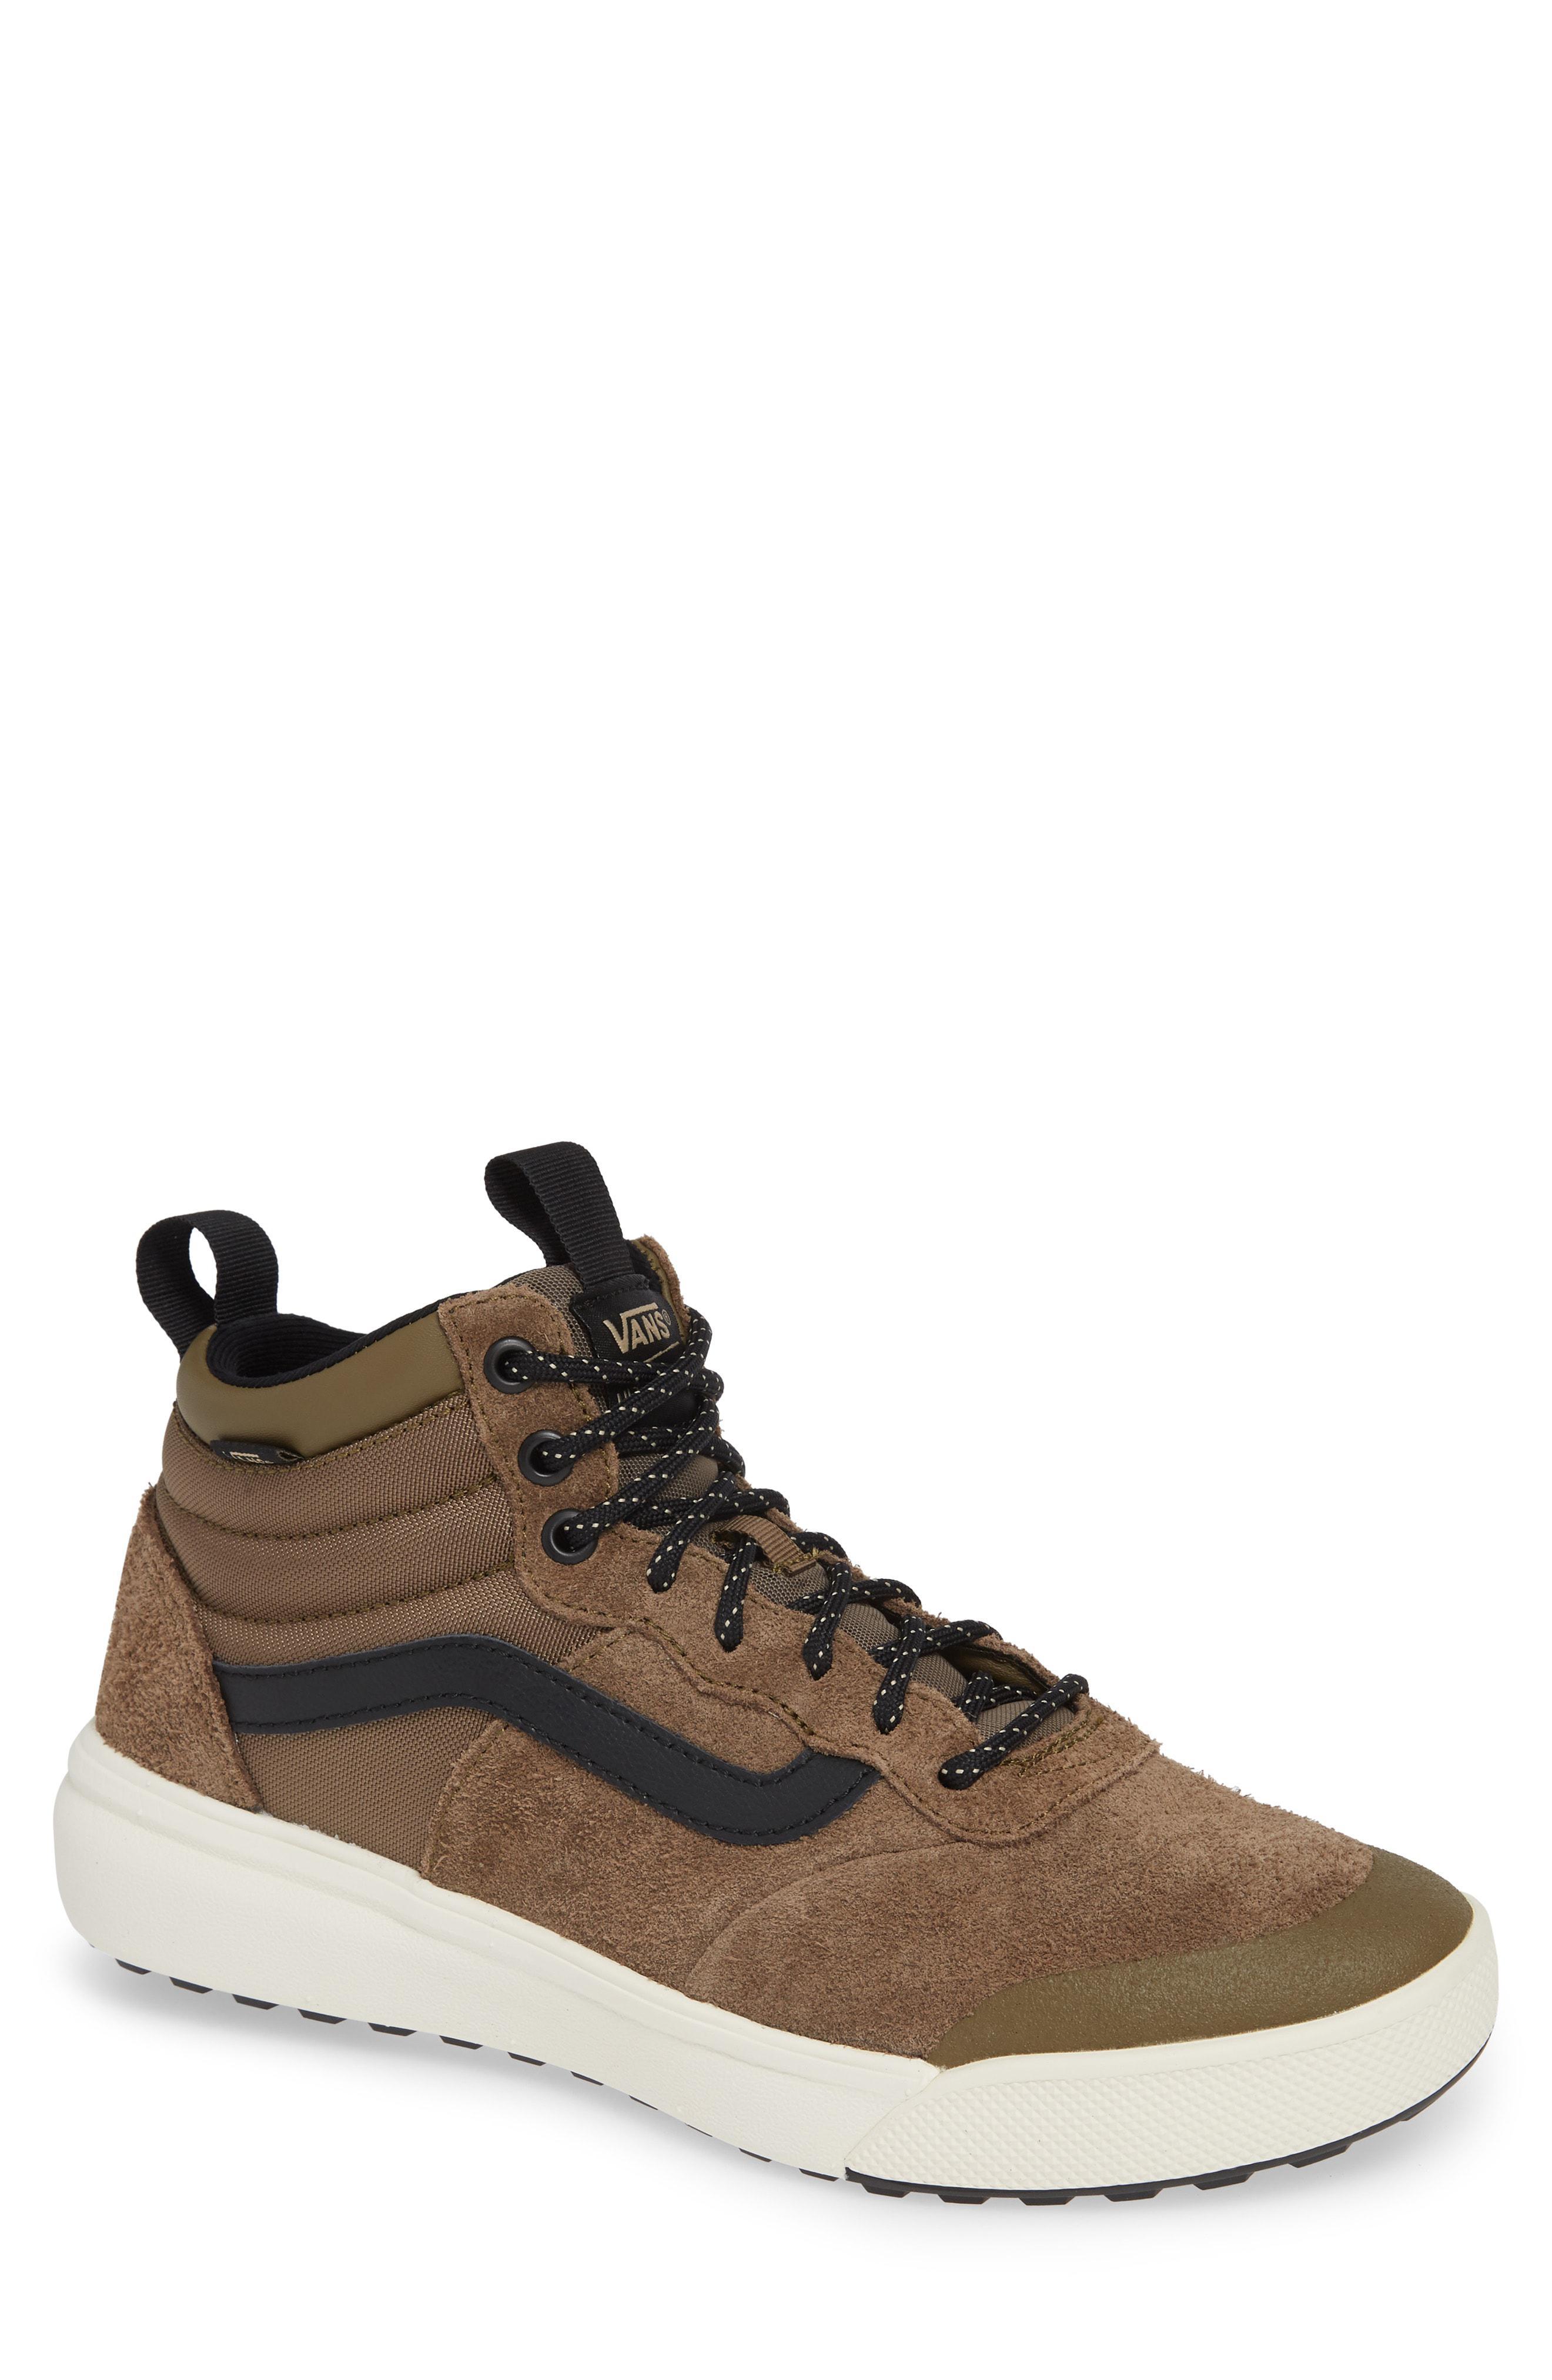 Lyst - Vans Ultrarange Hi Sneaker in Brown for Men f7284f72c